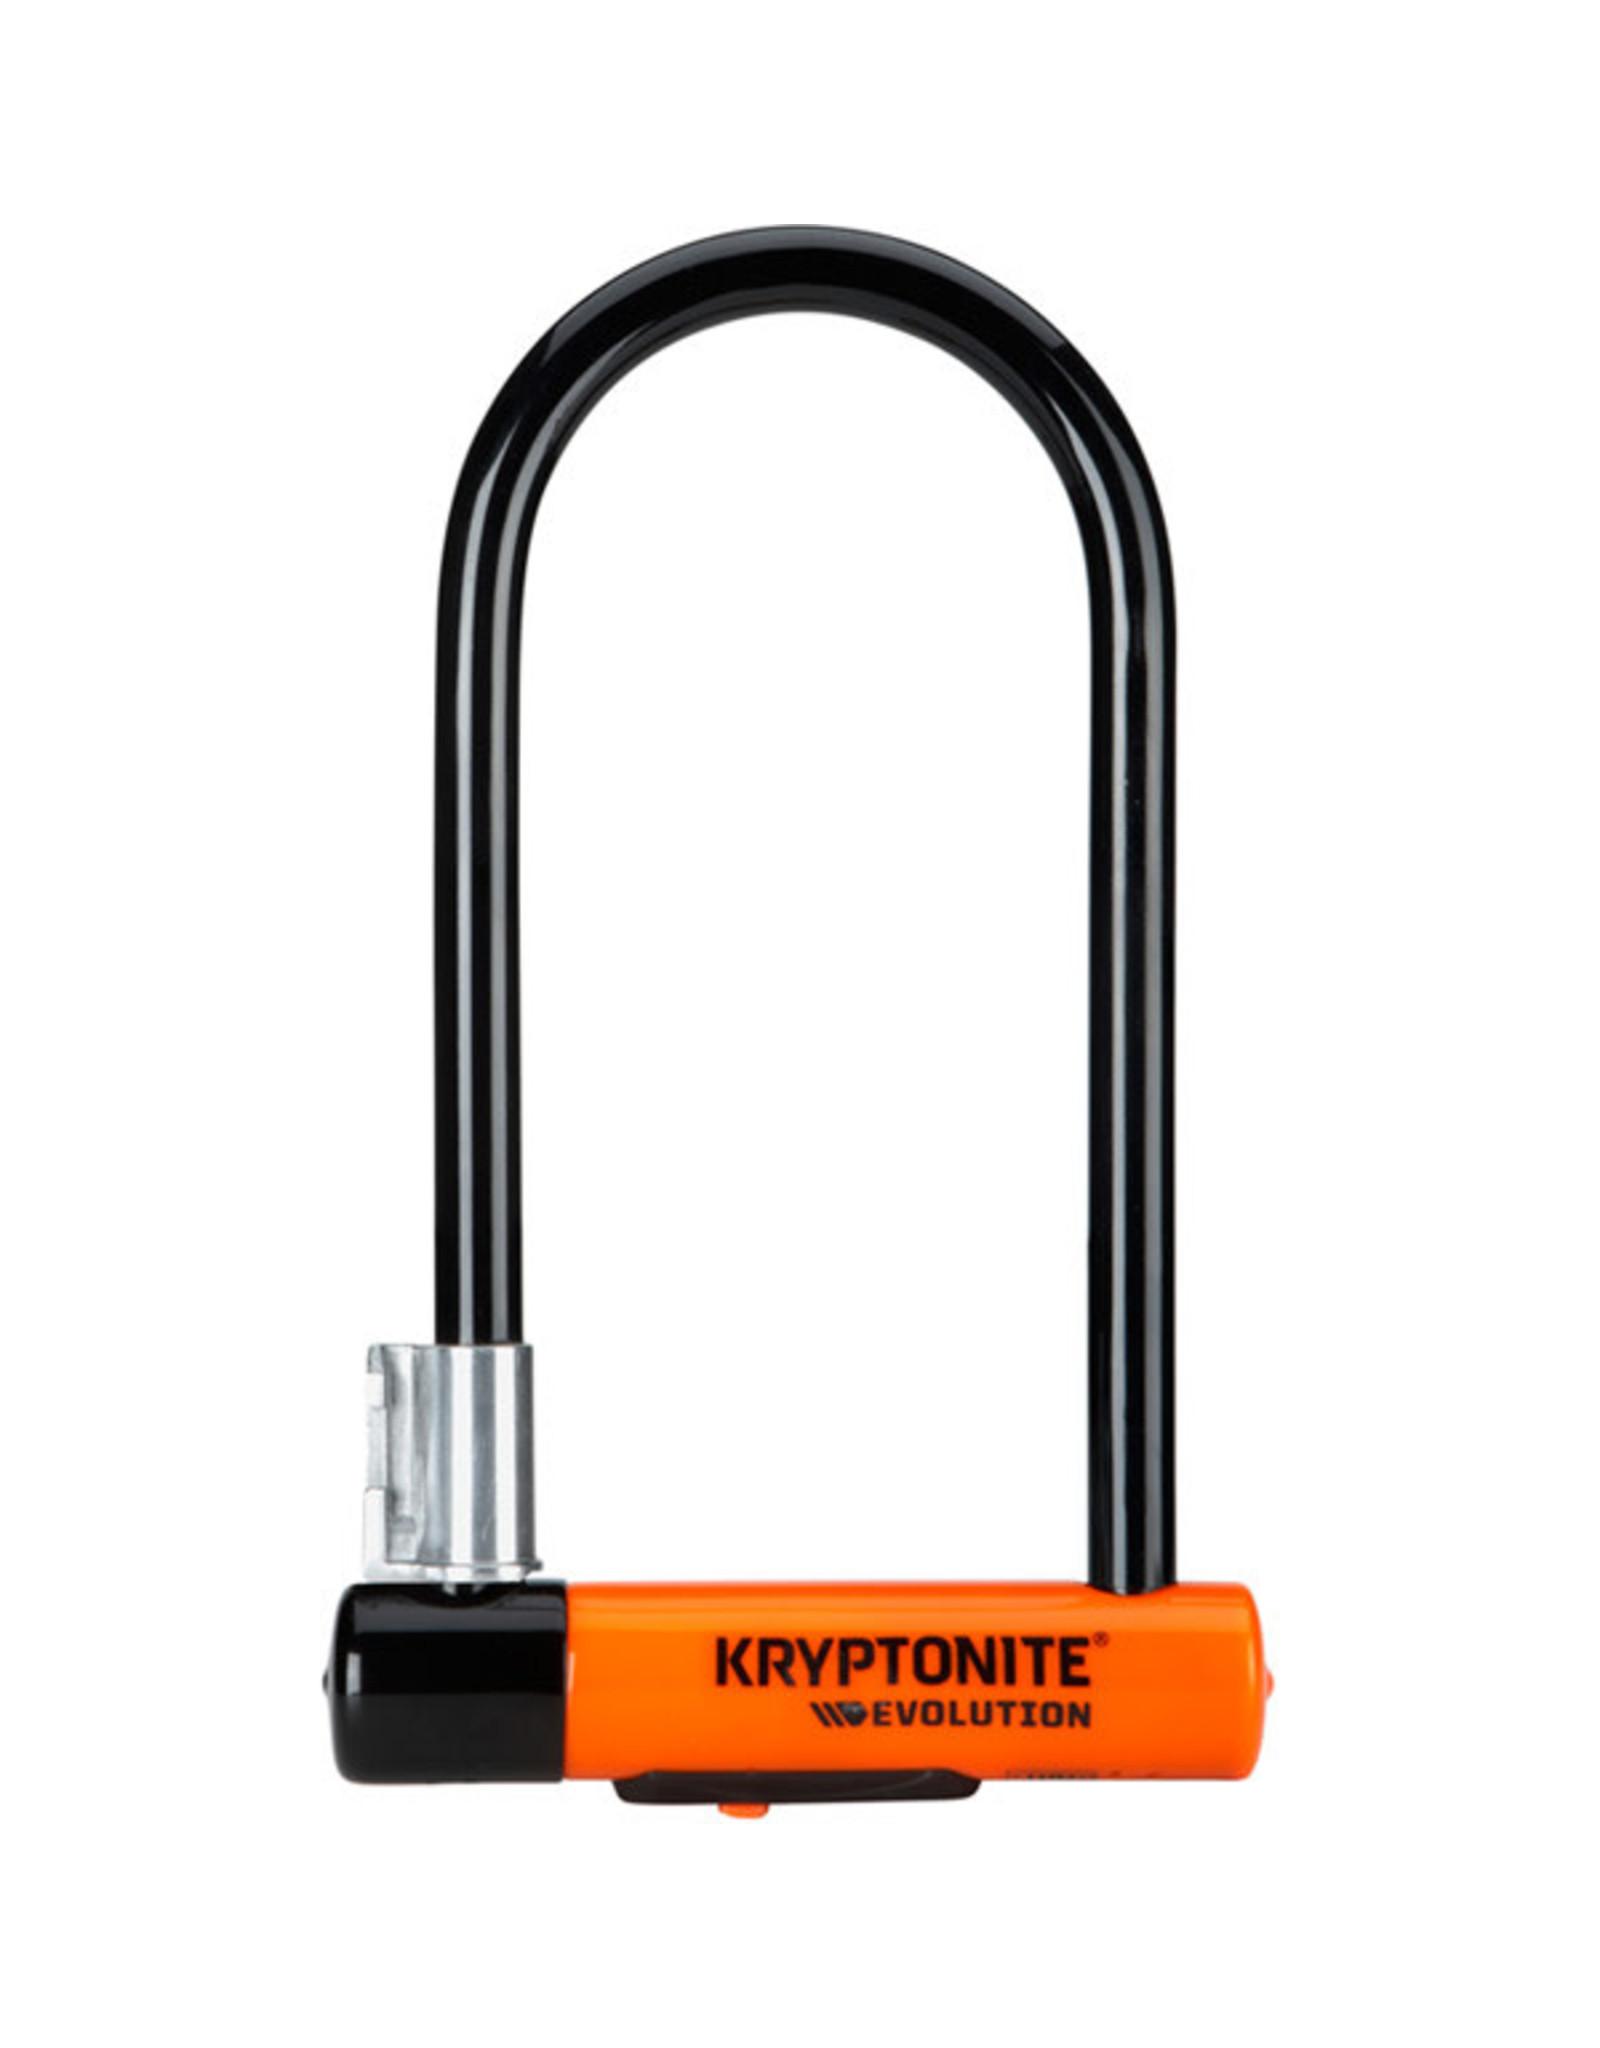 Kryptonite D-Lock Evolution Standard